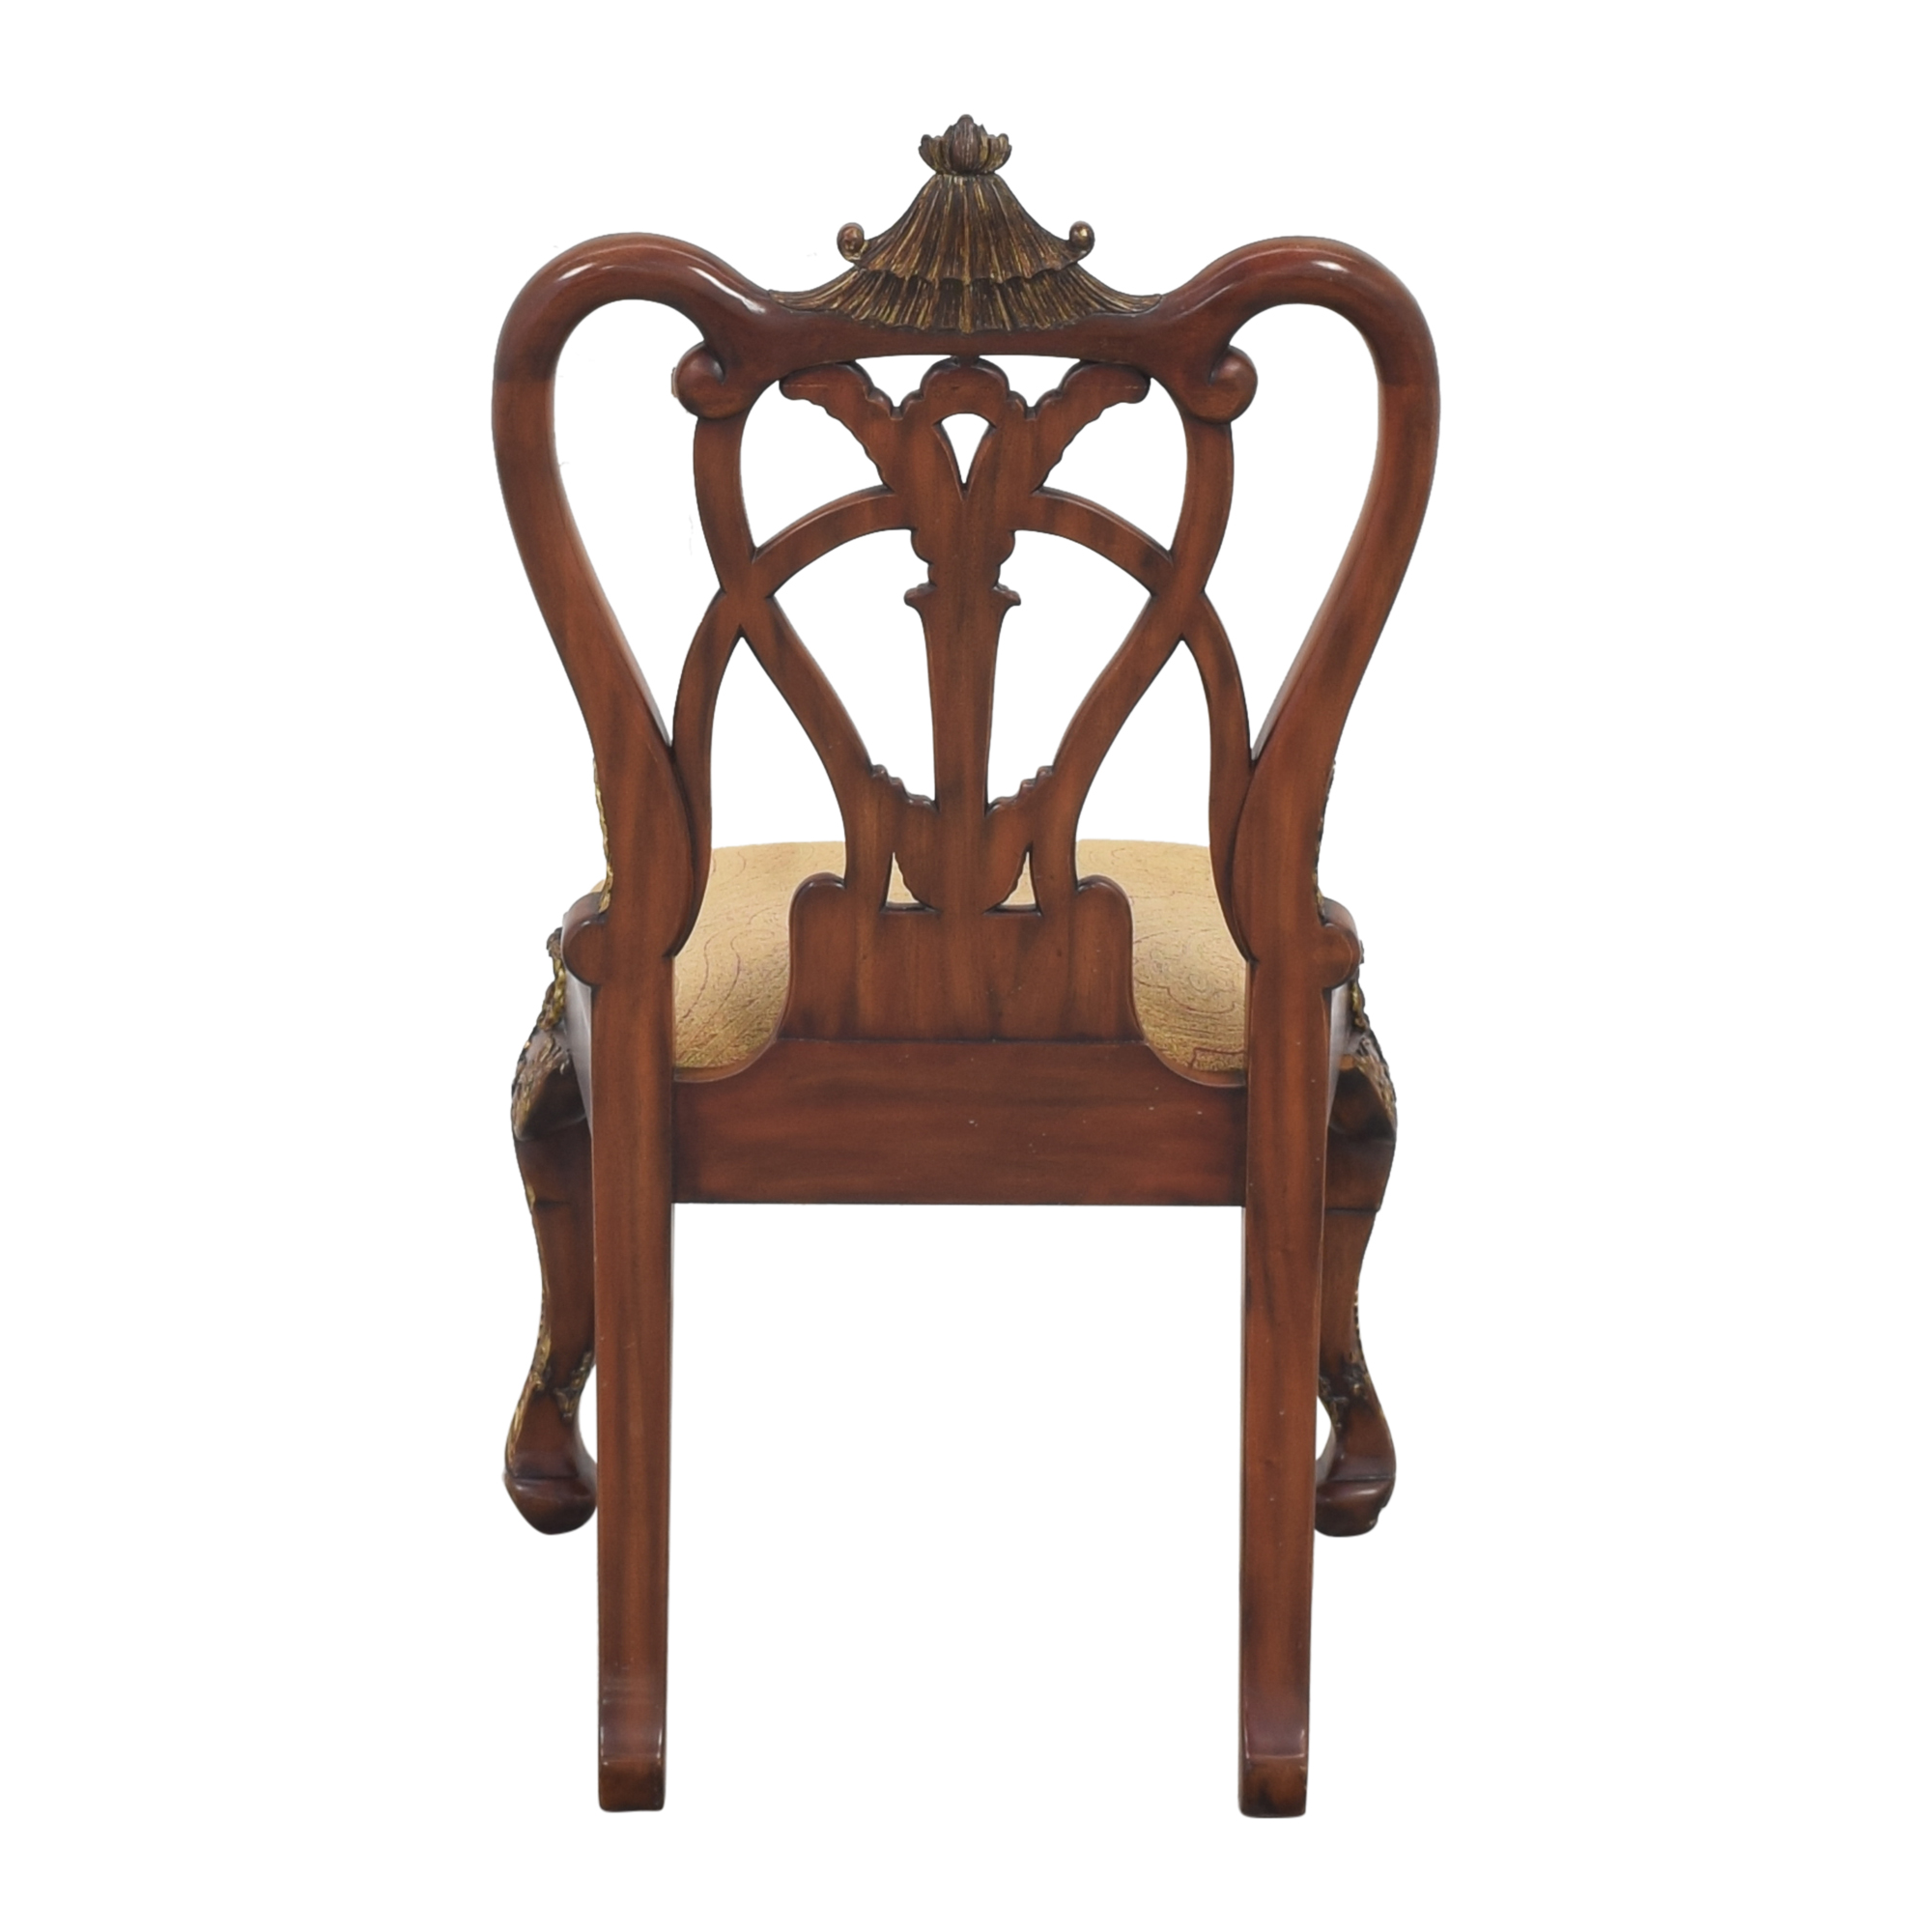 Maitland-Smith Maitland-Smith Decorative Dining Chair ct